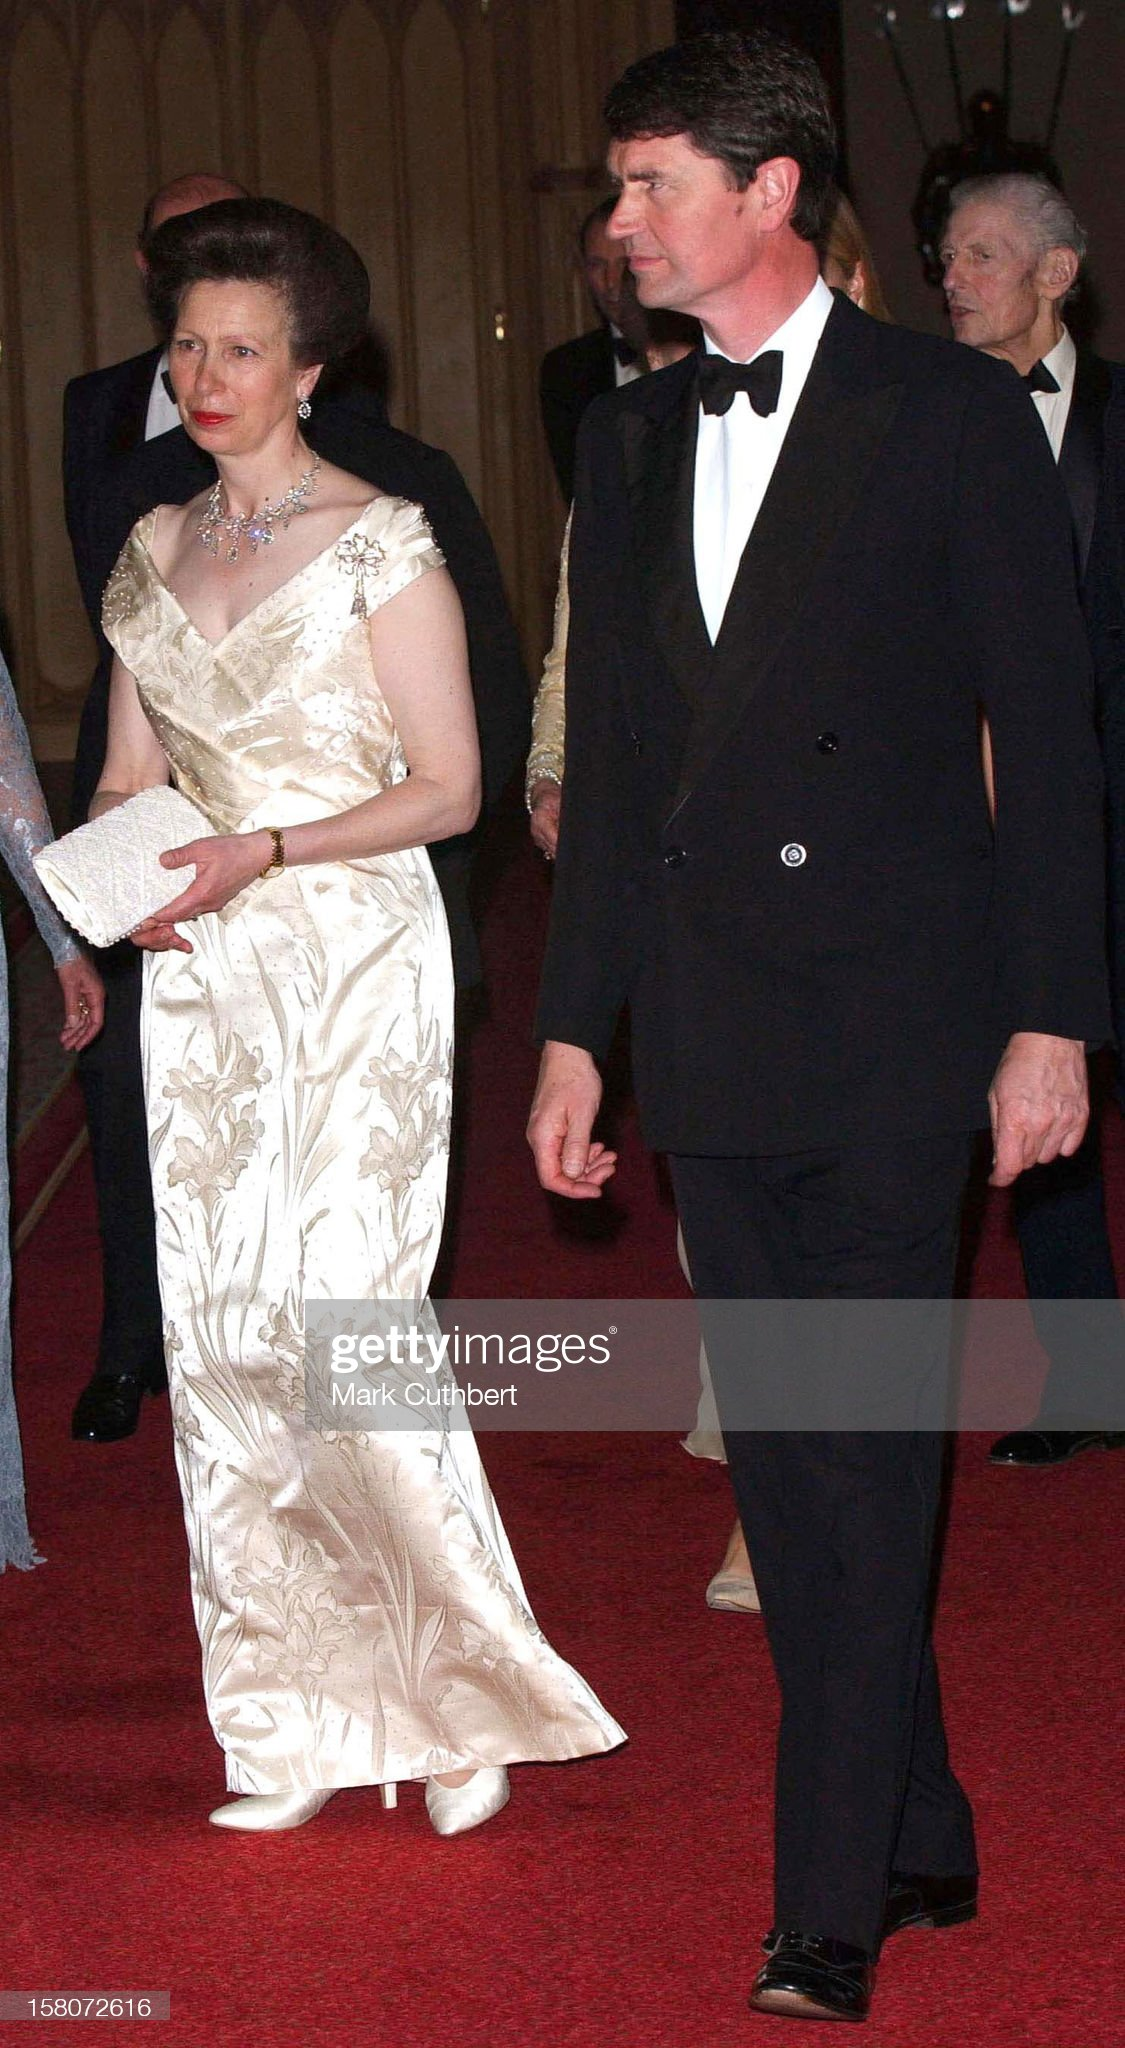 Golden Jubilee Royal Dinner At Windsor Castle. : News Photo